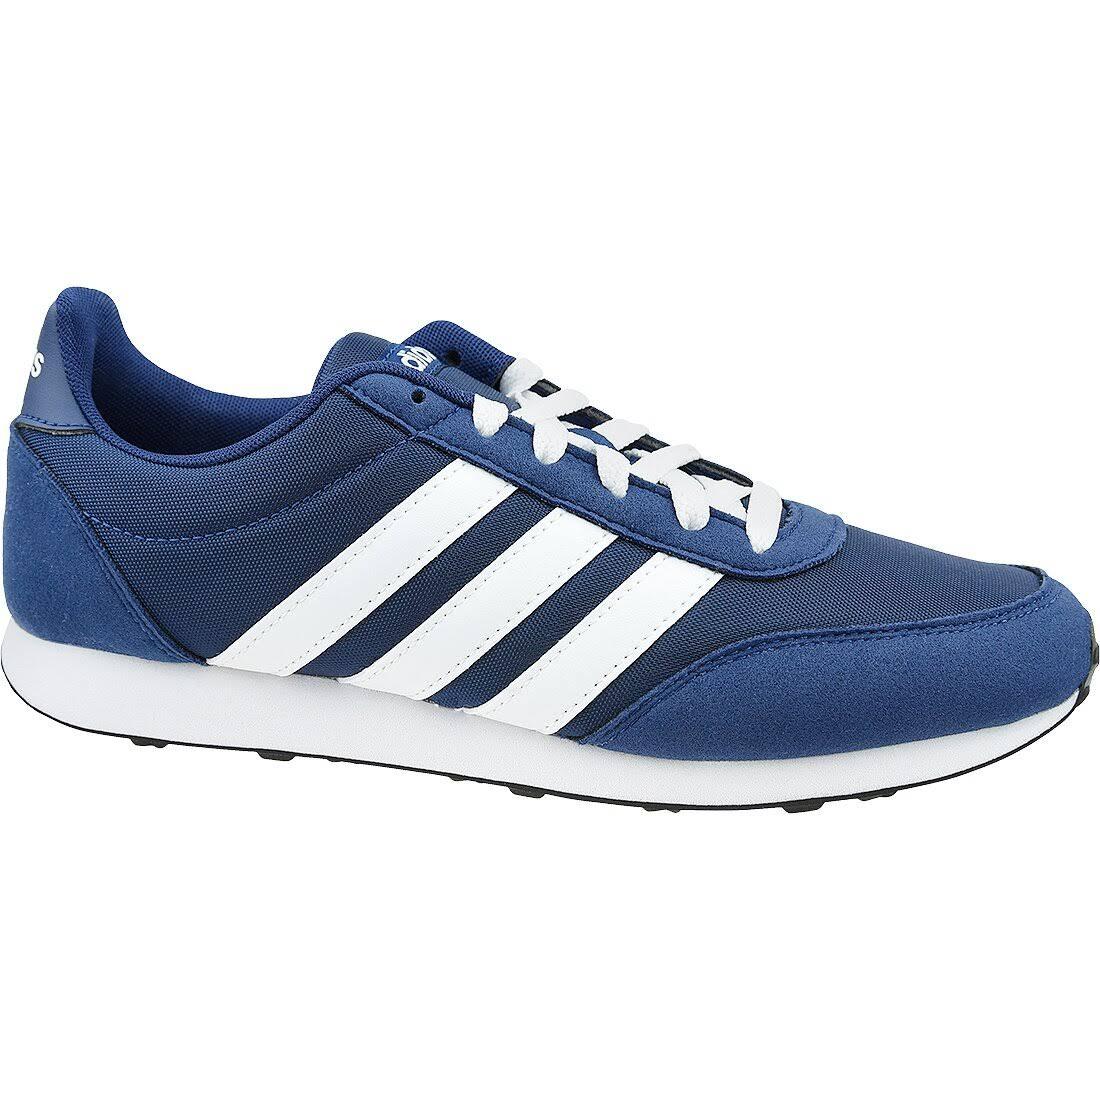 (6) adidas V Racer 2.0 B75795 Mens Navy Blue sneakers